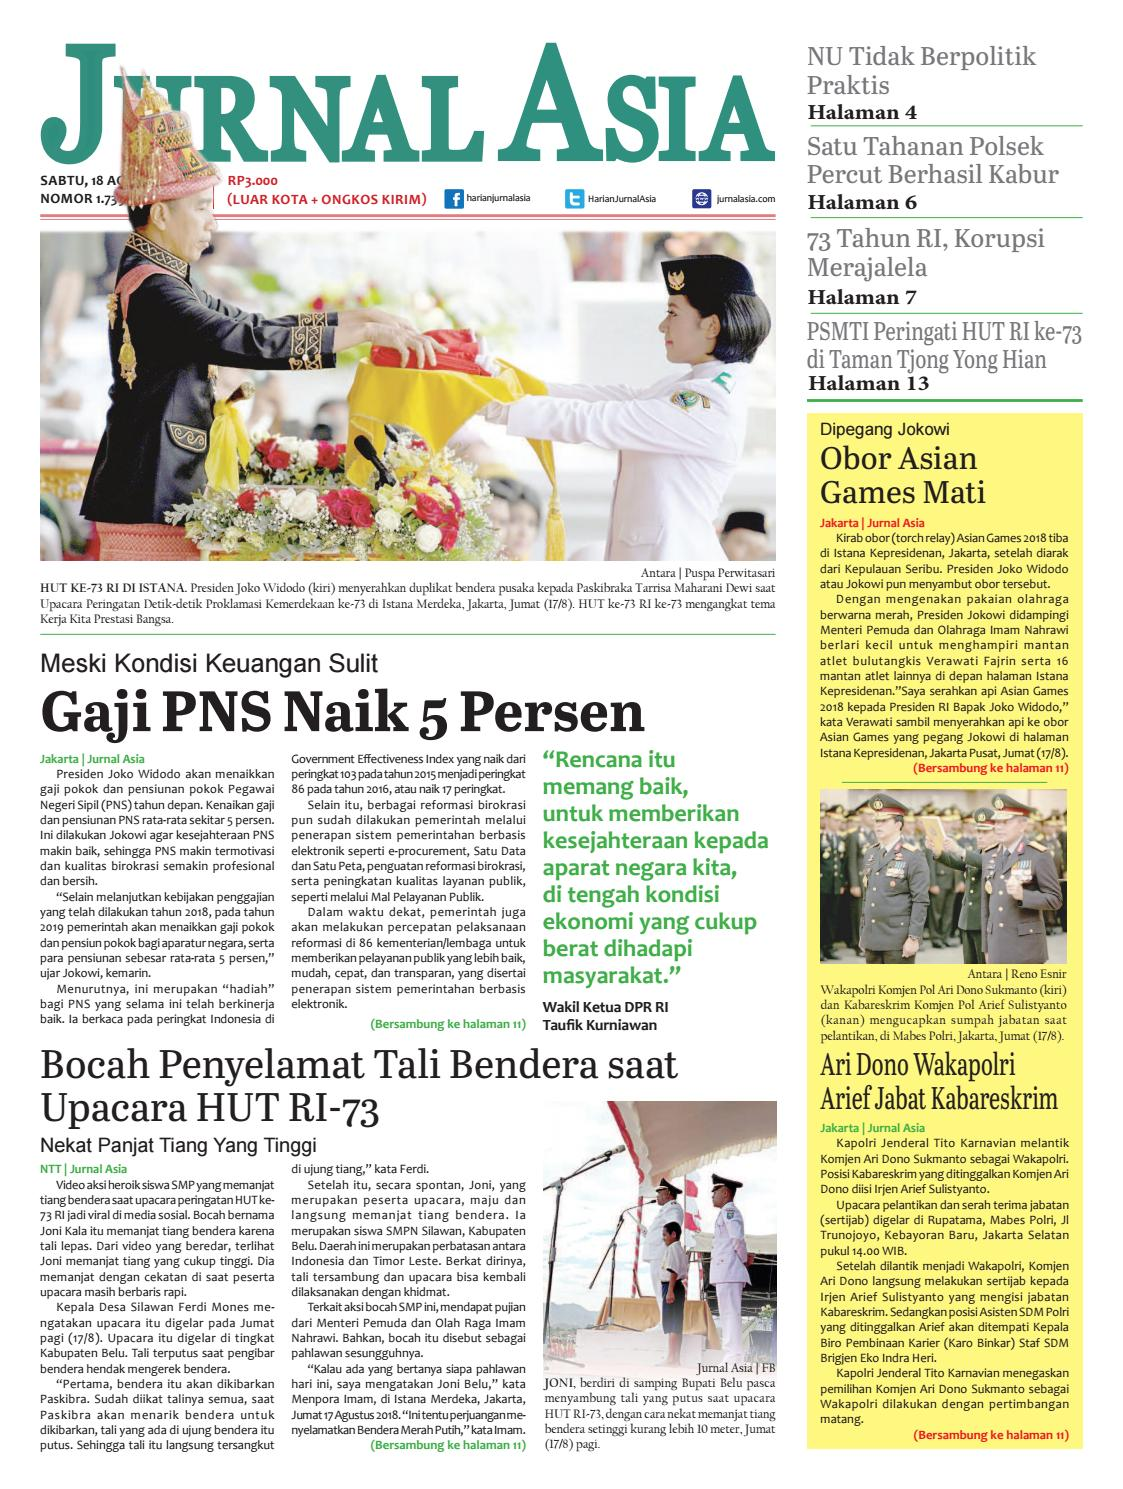 Harian Jurnal Asia Edisi Sabtu a6eb80f03f